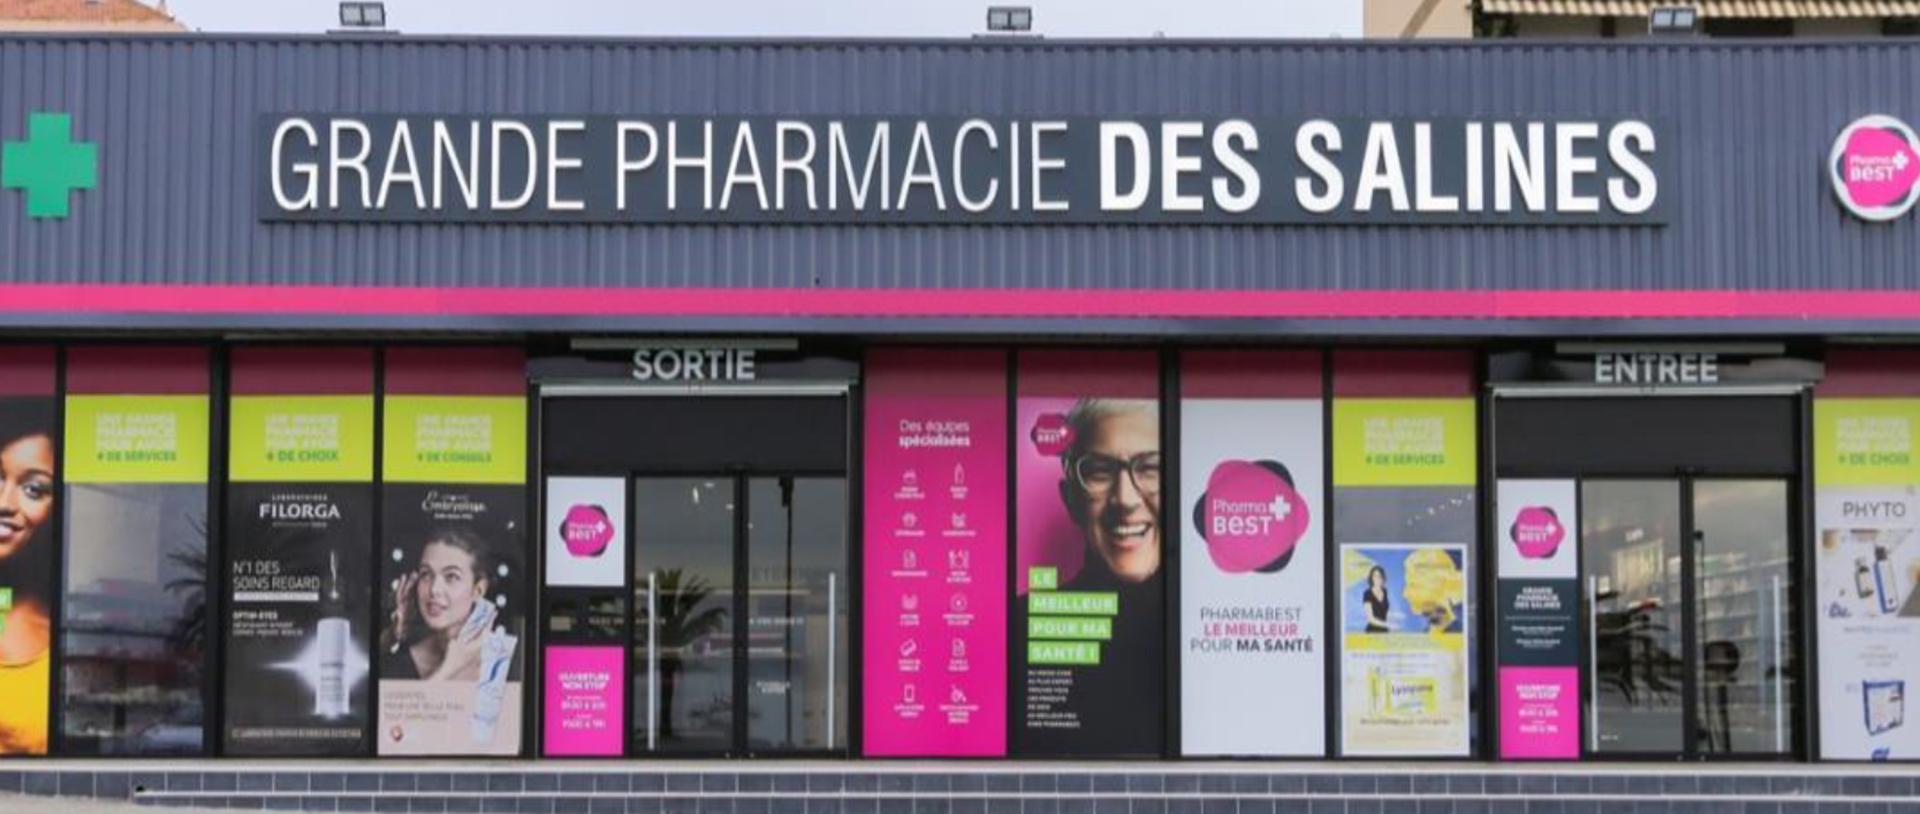 Pharmacie des Salines